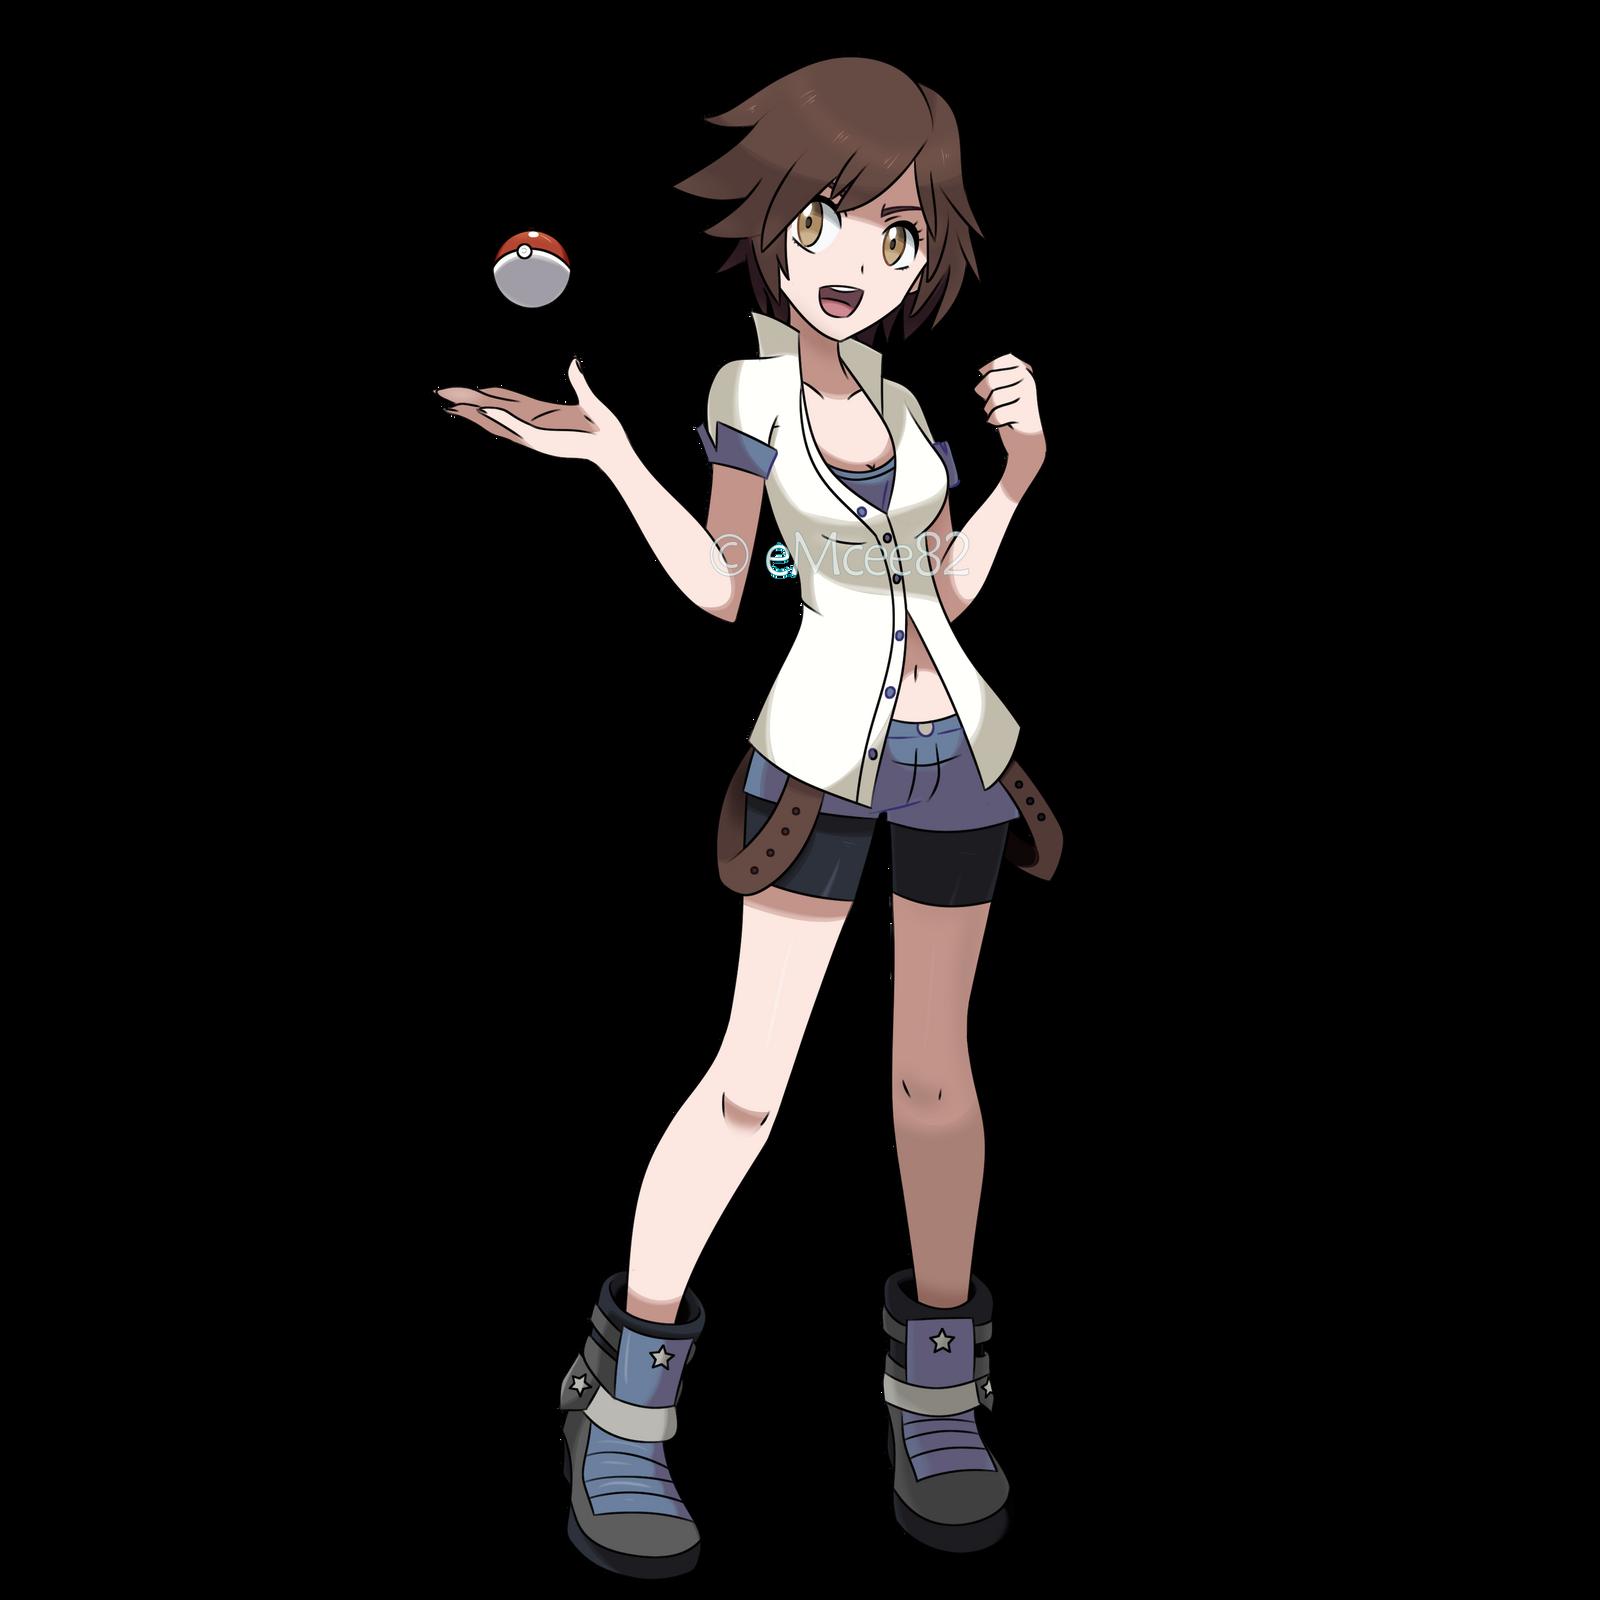 asuka kazama as pokemon trainer by emcee82 on deviantart